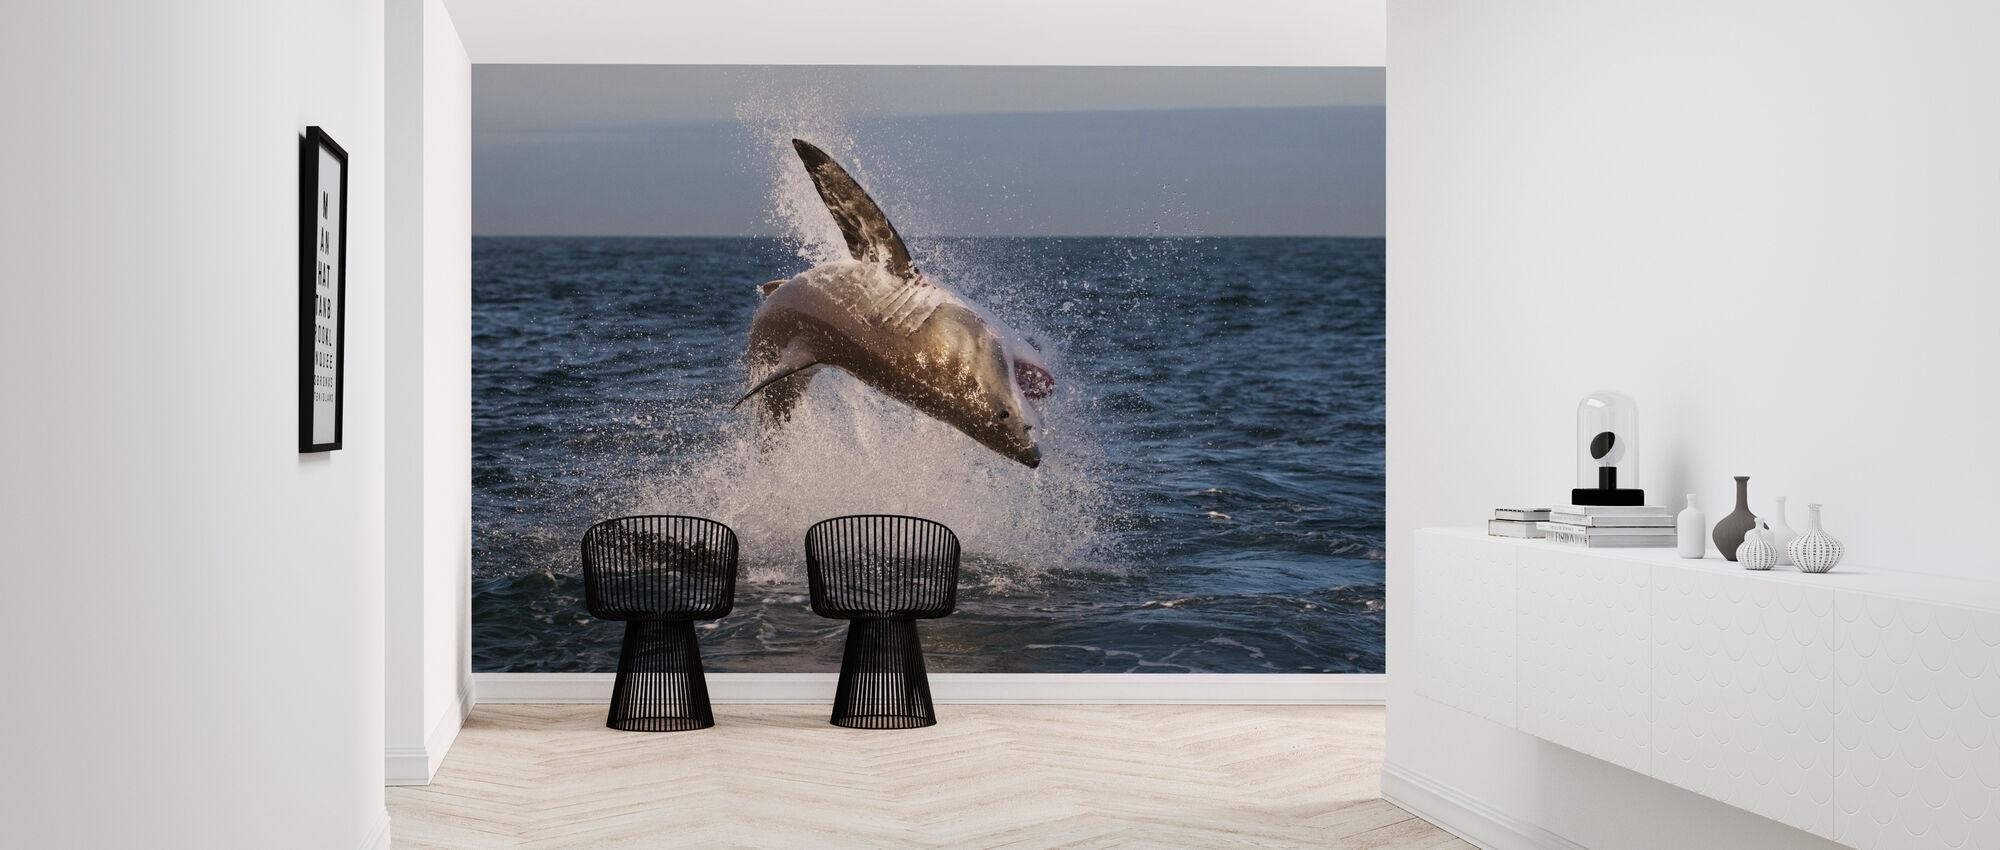 Breaching Great White Shark - Wallpaper - Hallway